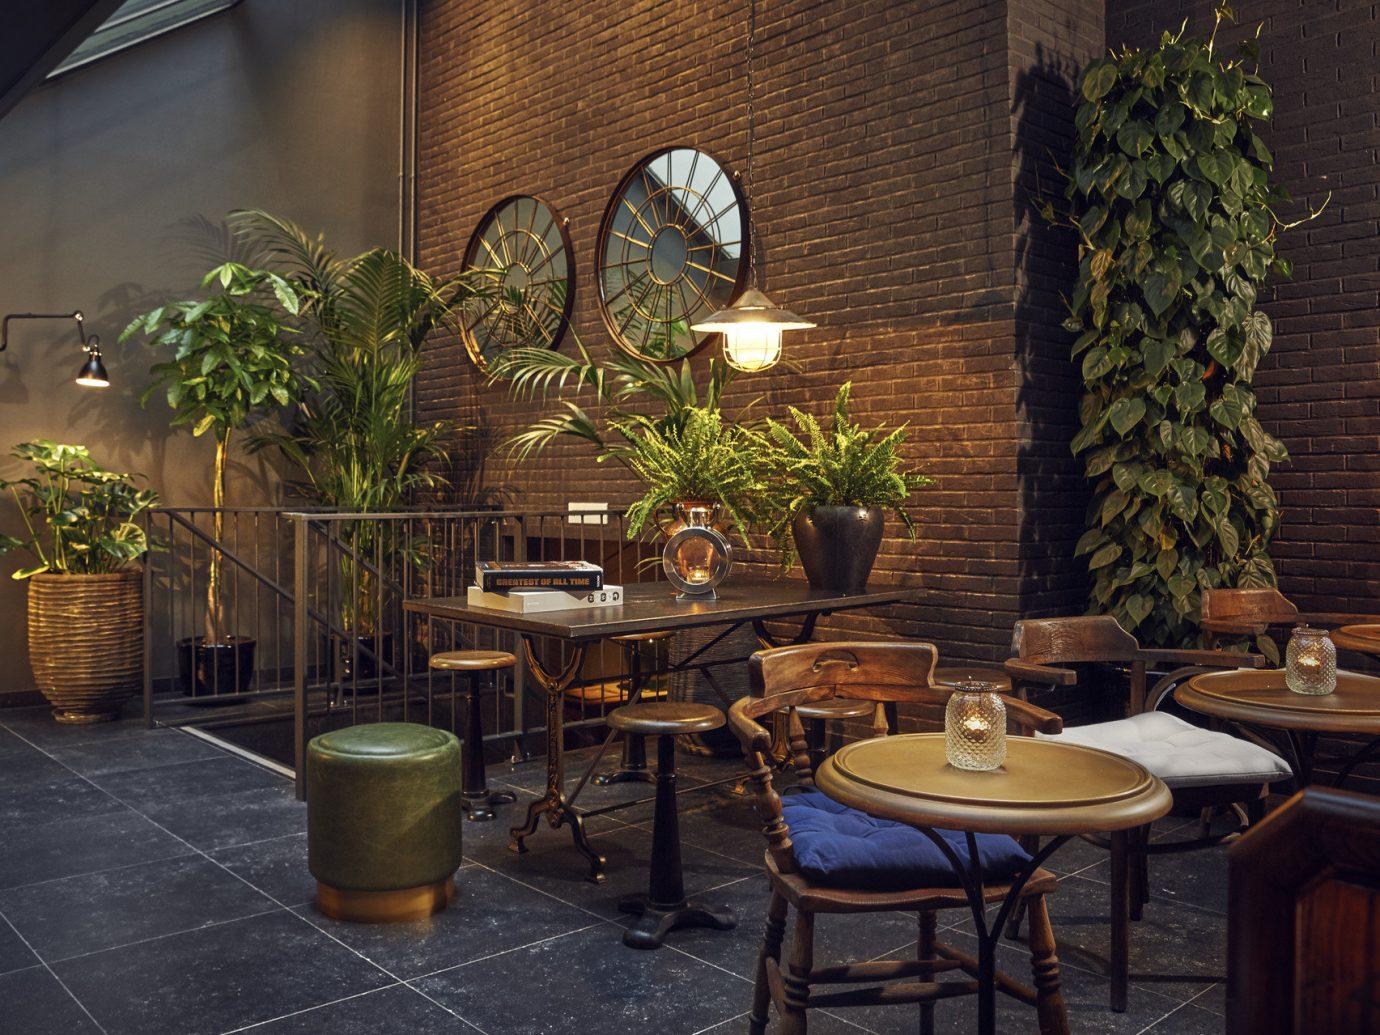 Amsterdam Hotels The Netherlands room Lobby restaurant estate interior design home dining room lighting Courtyard plant furniture